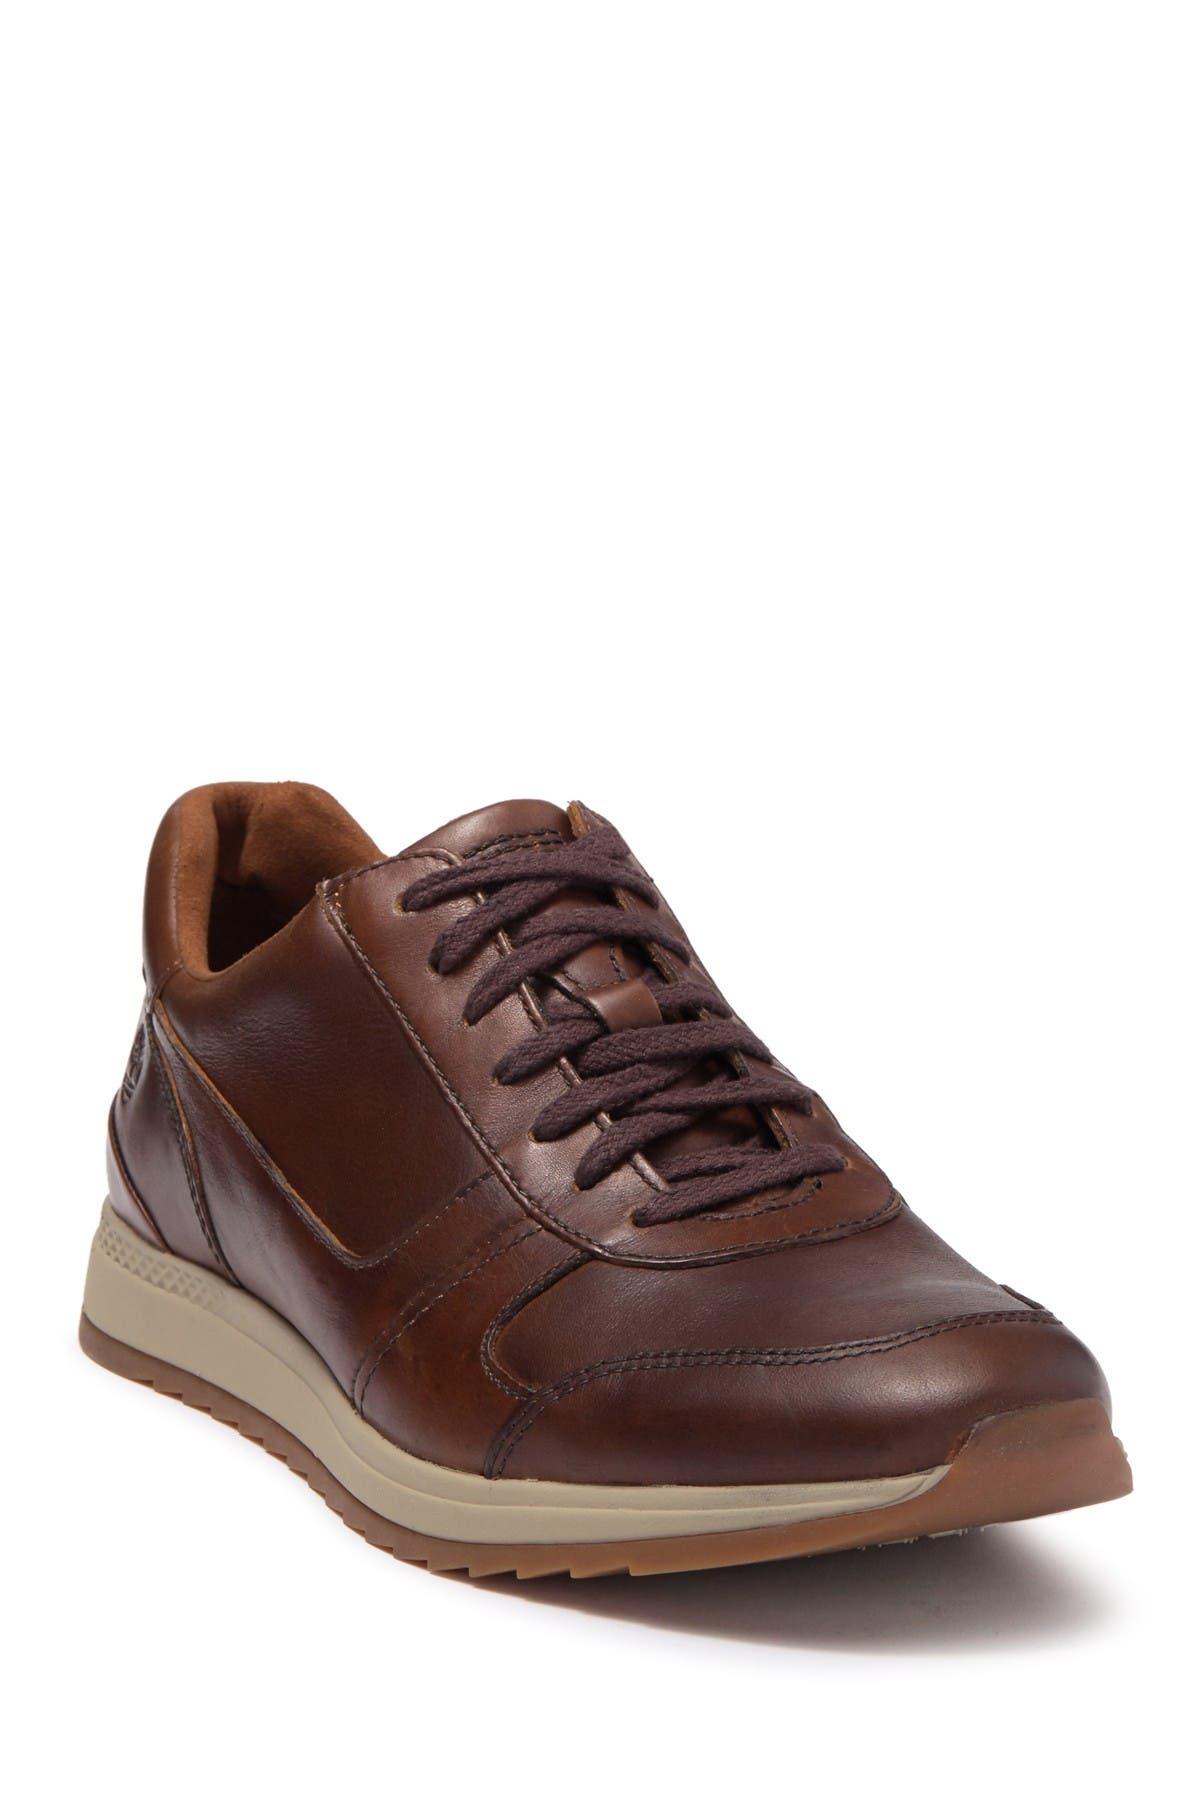 Timberland | Madaket Leather Sneaker